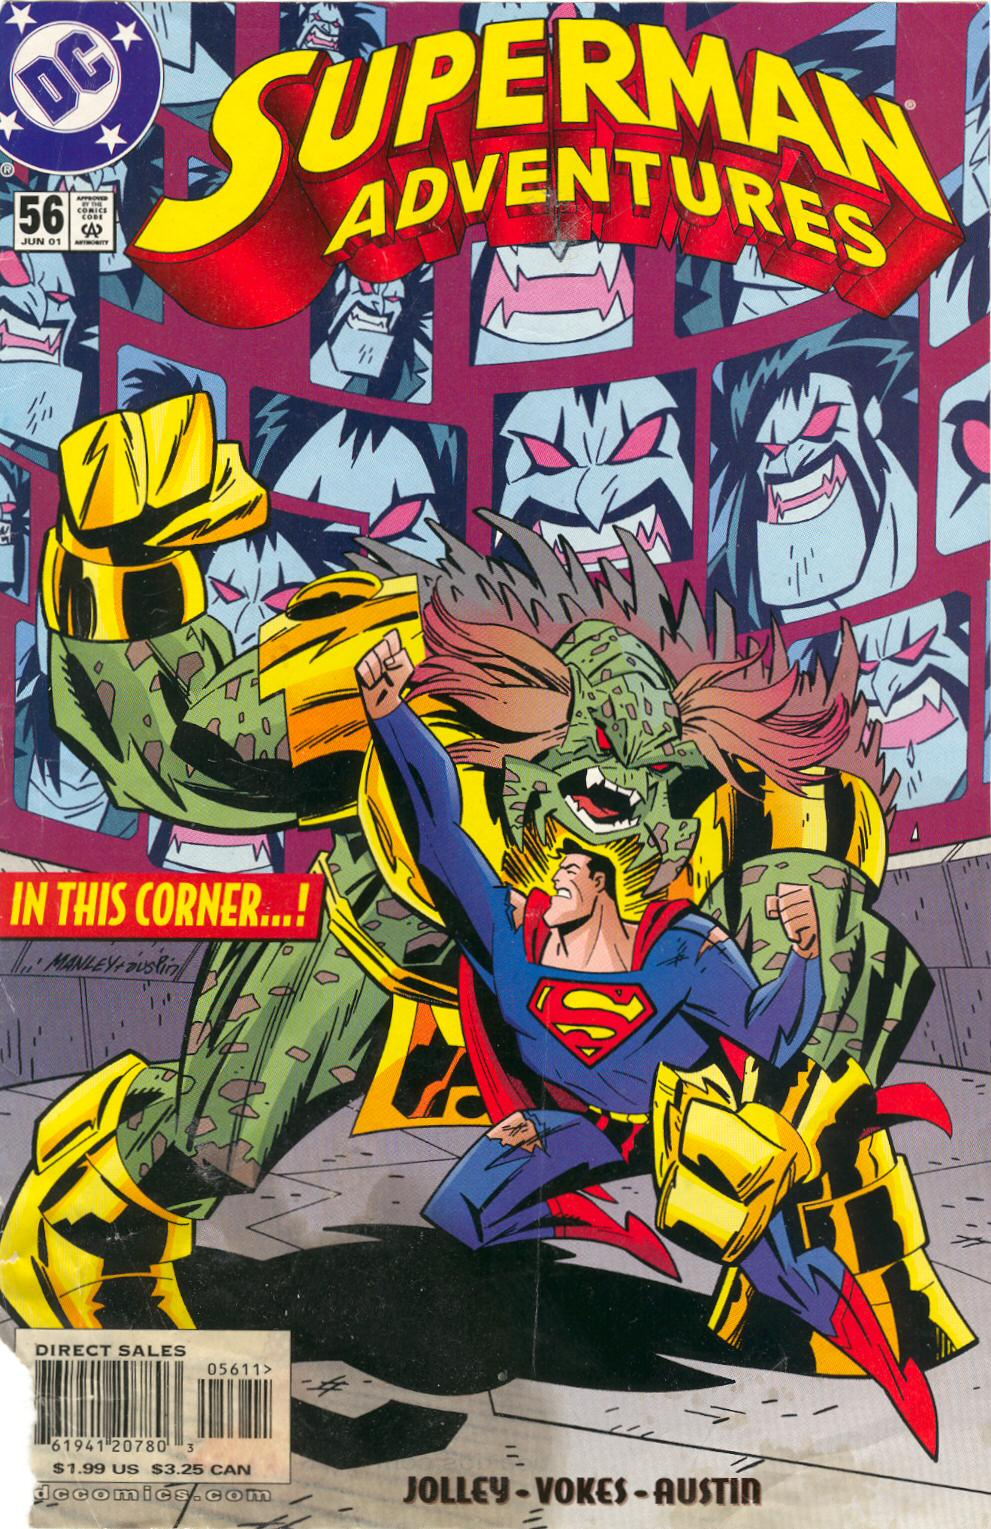 Superman Adventures 56 Page 1